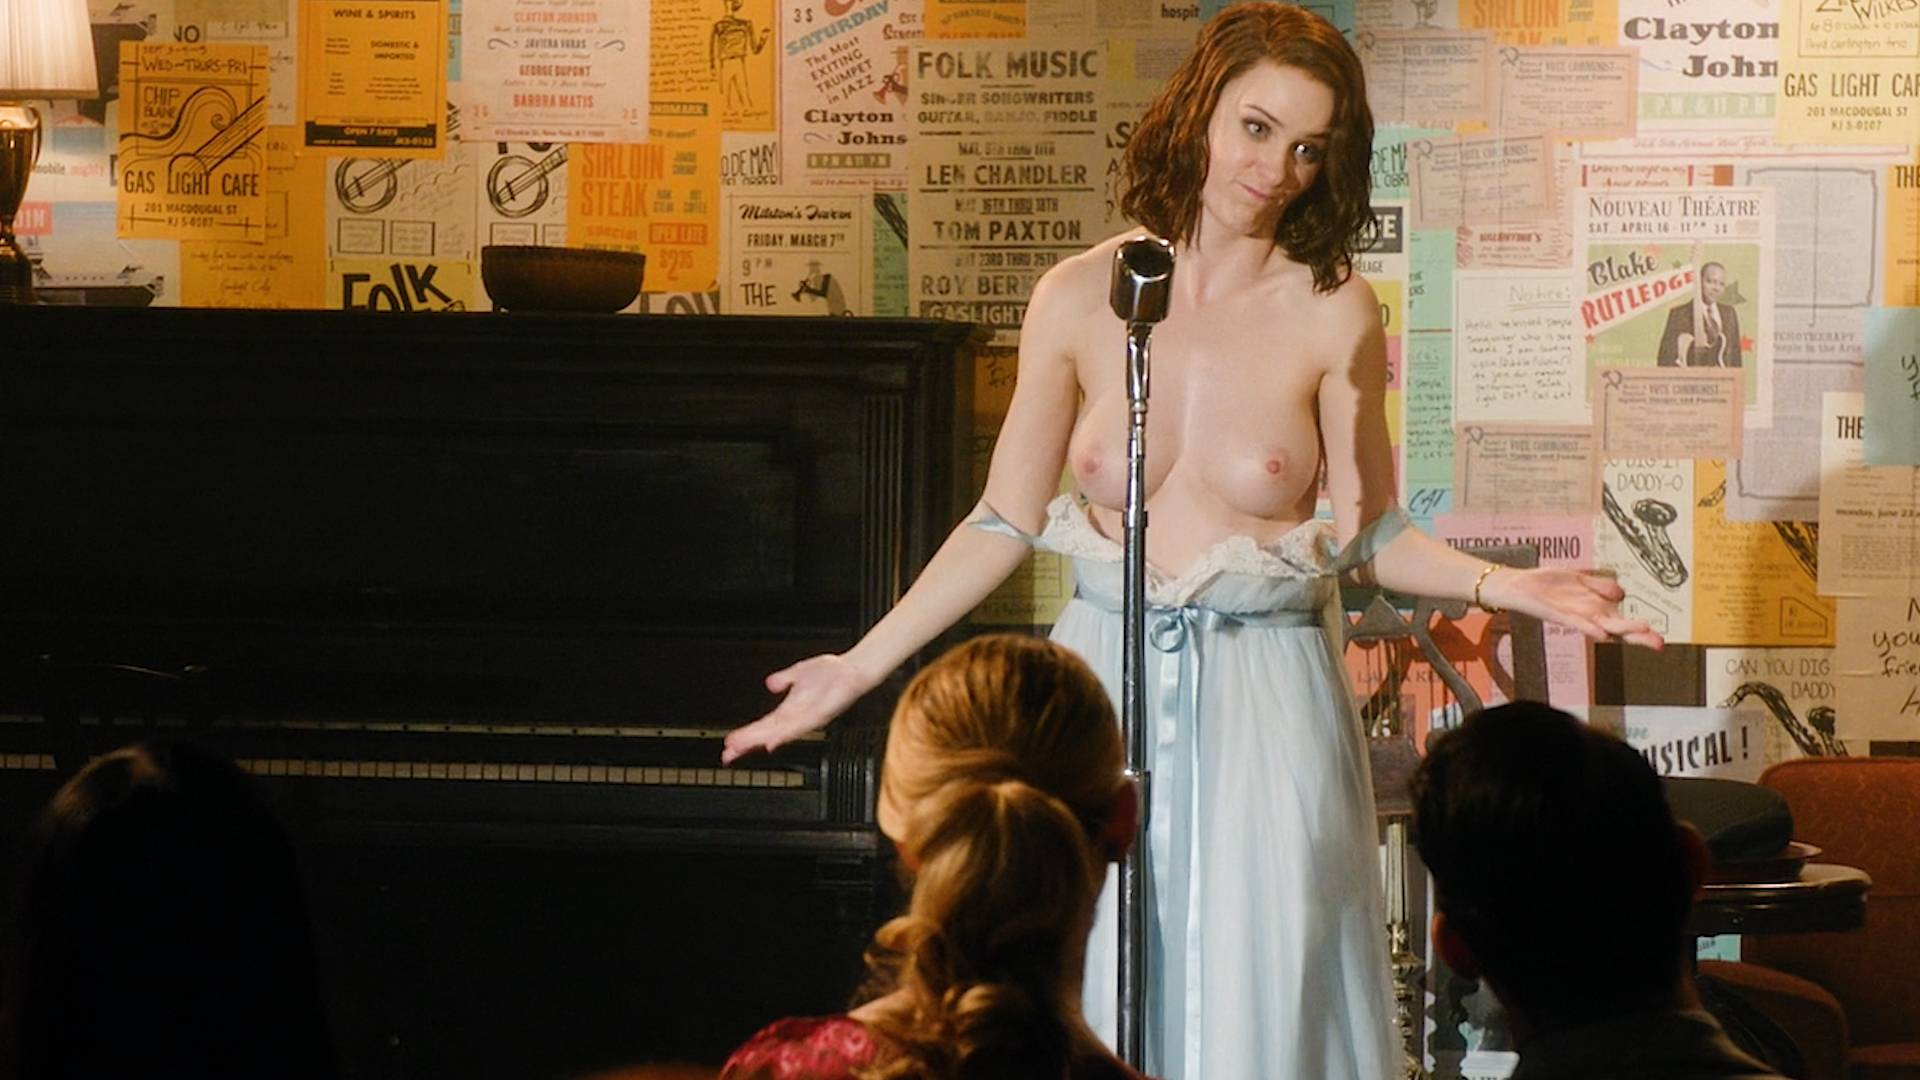 Rachel-Brosnahan-nude-topless-and-butt-Kyla-Walker-hot-The-Marvelous-Mrs-Maisel-2017-s1e1-HD-1080p-00008.jpg